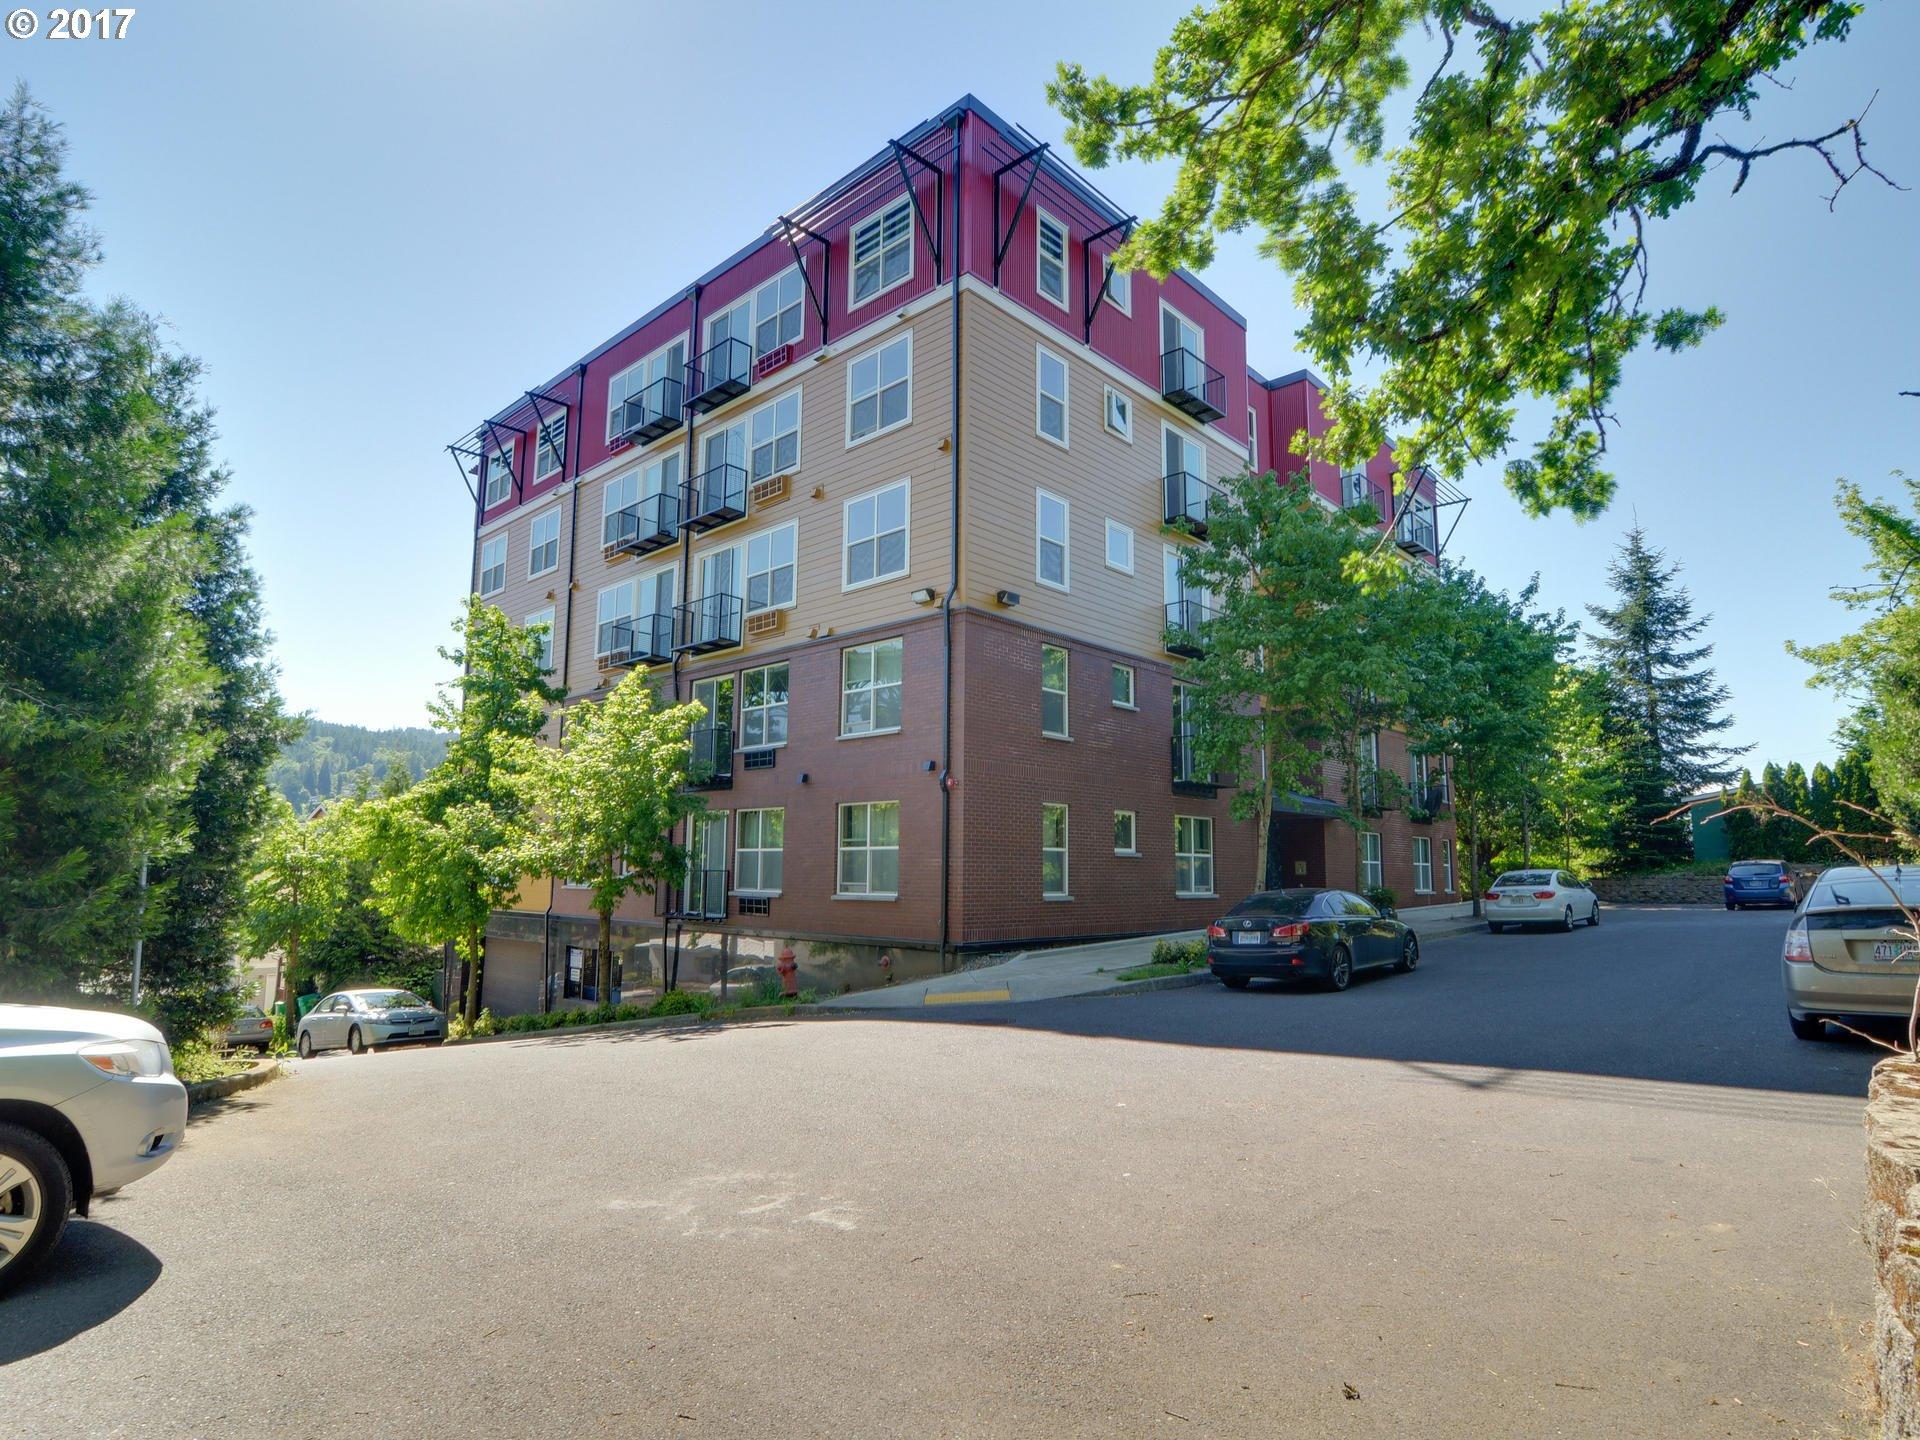 8712 N DECATUR ST 301 Portland, OR 97203 - MLS #: 17624068